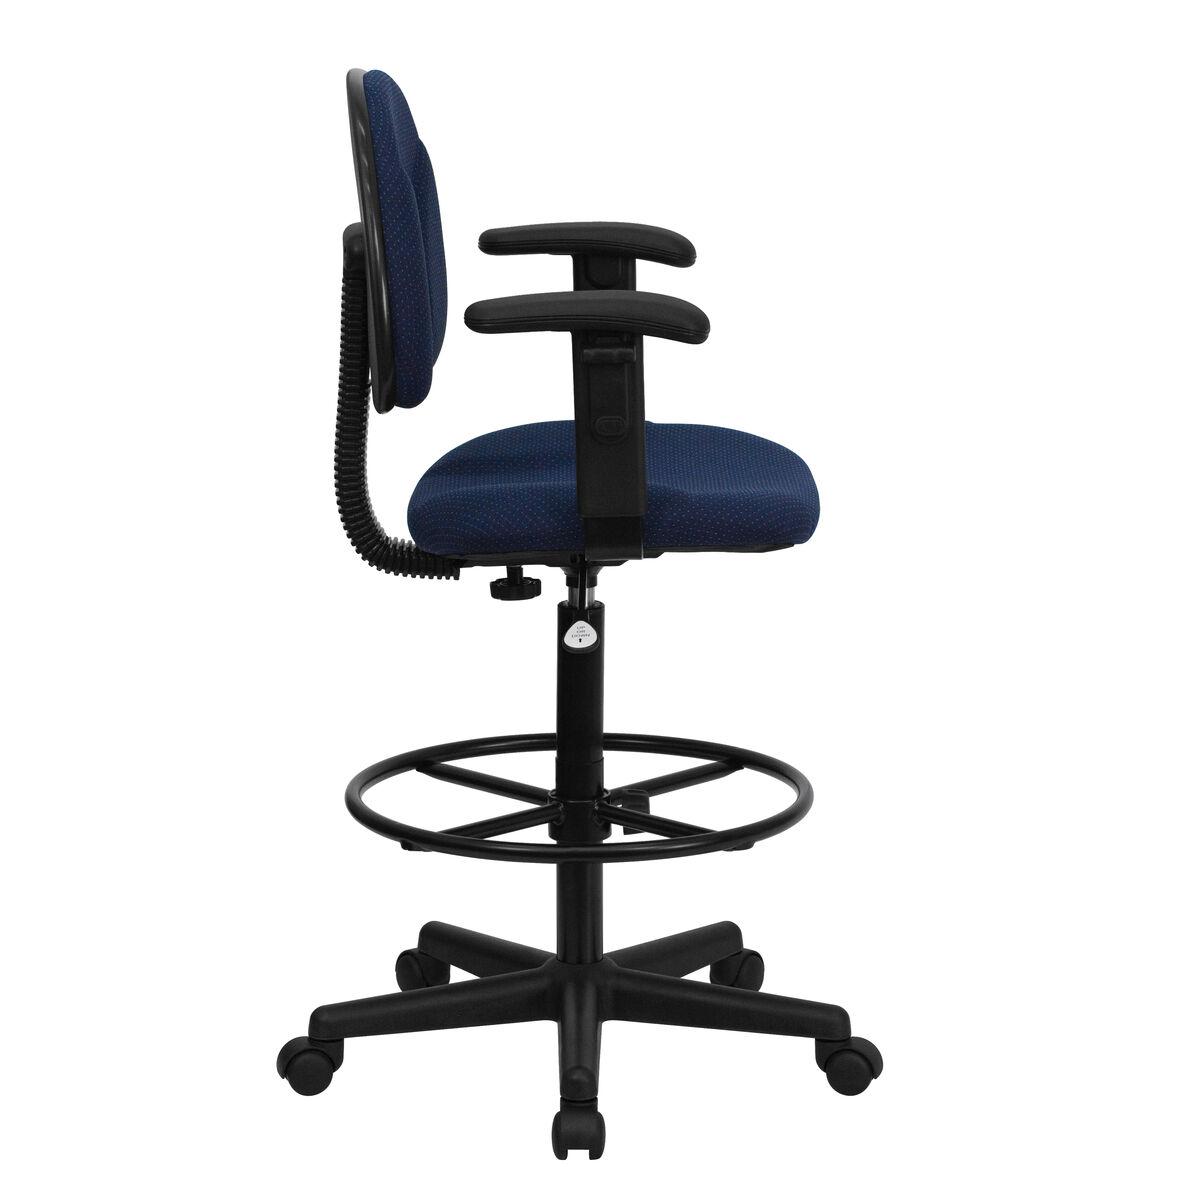 Emb Navy Fabric Draft Chair Bt 659 Nvy Arms Gg Bizchair Com